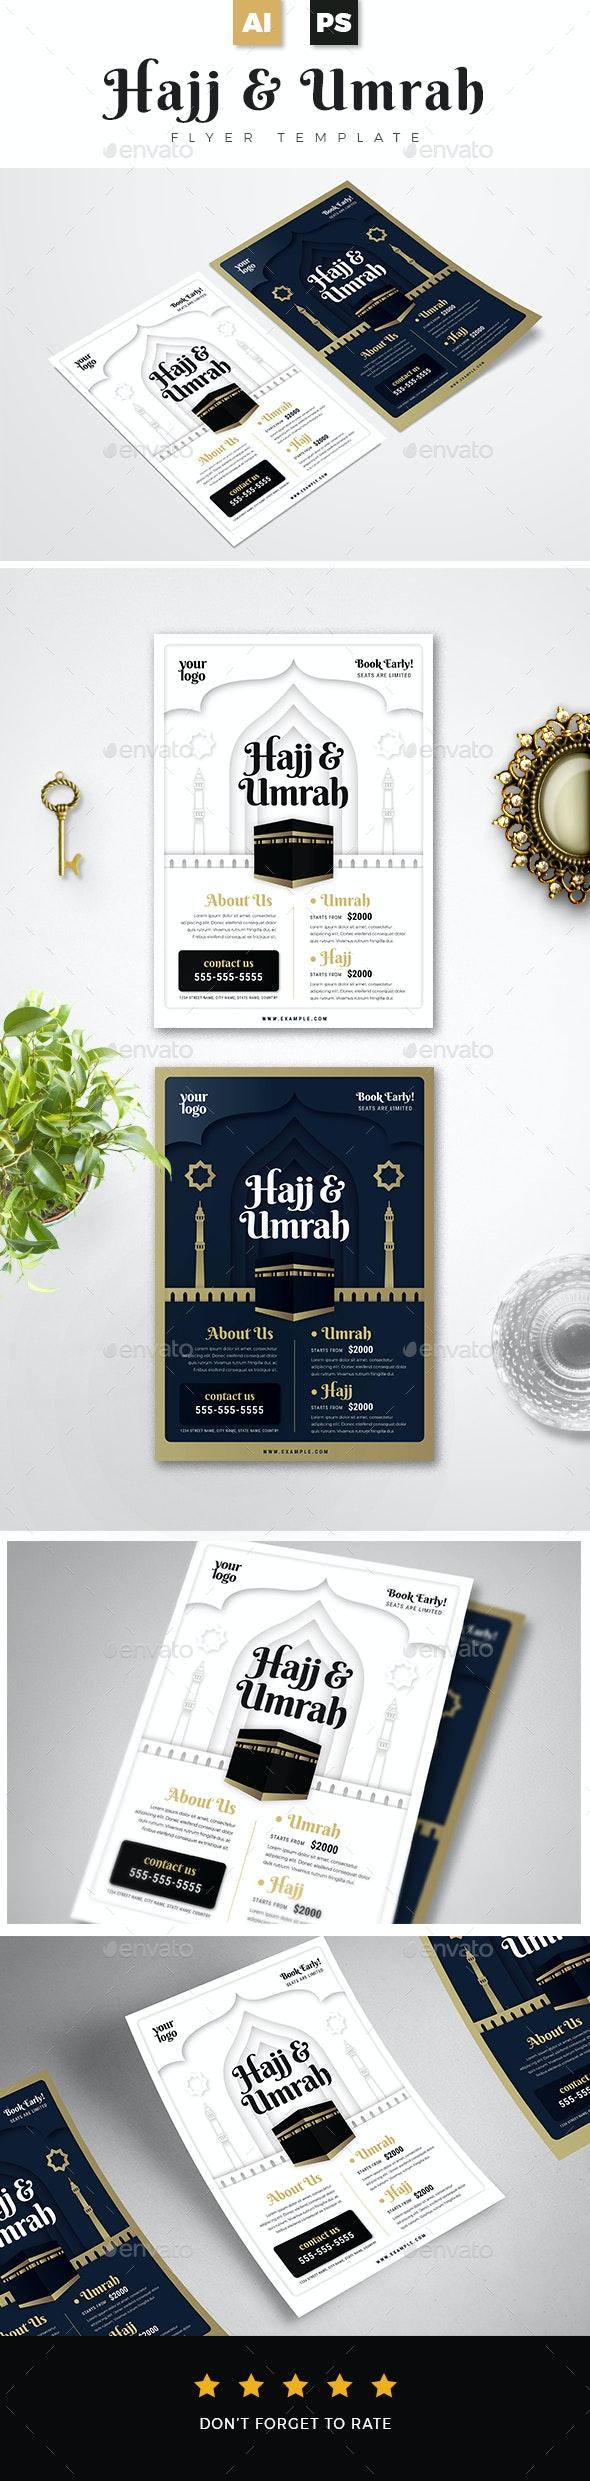 Umrah & Hajj Flyer Template - Corporate Flyers